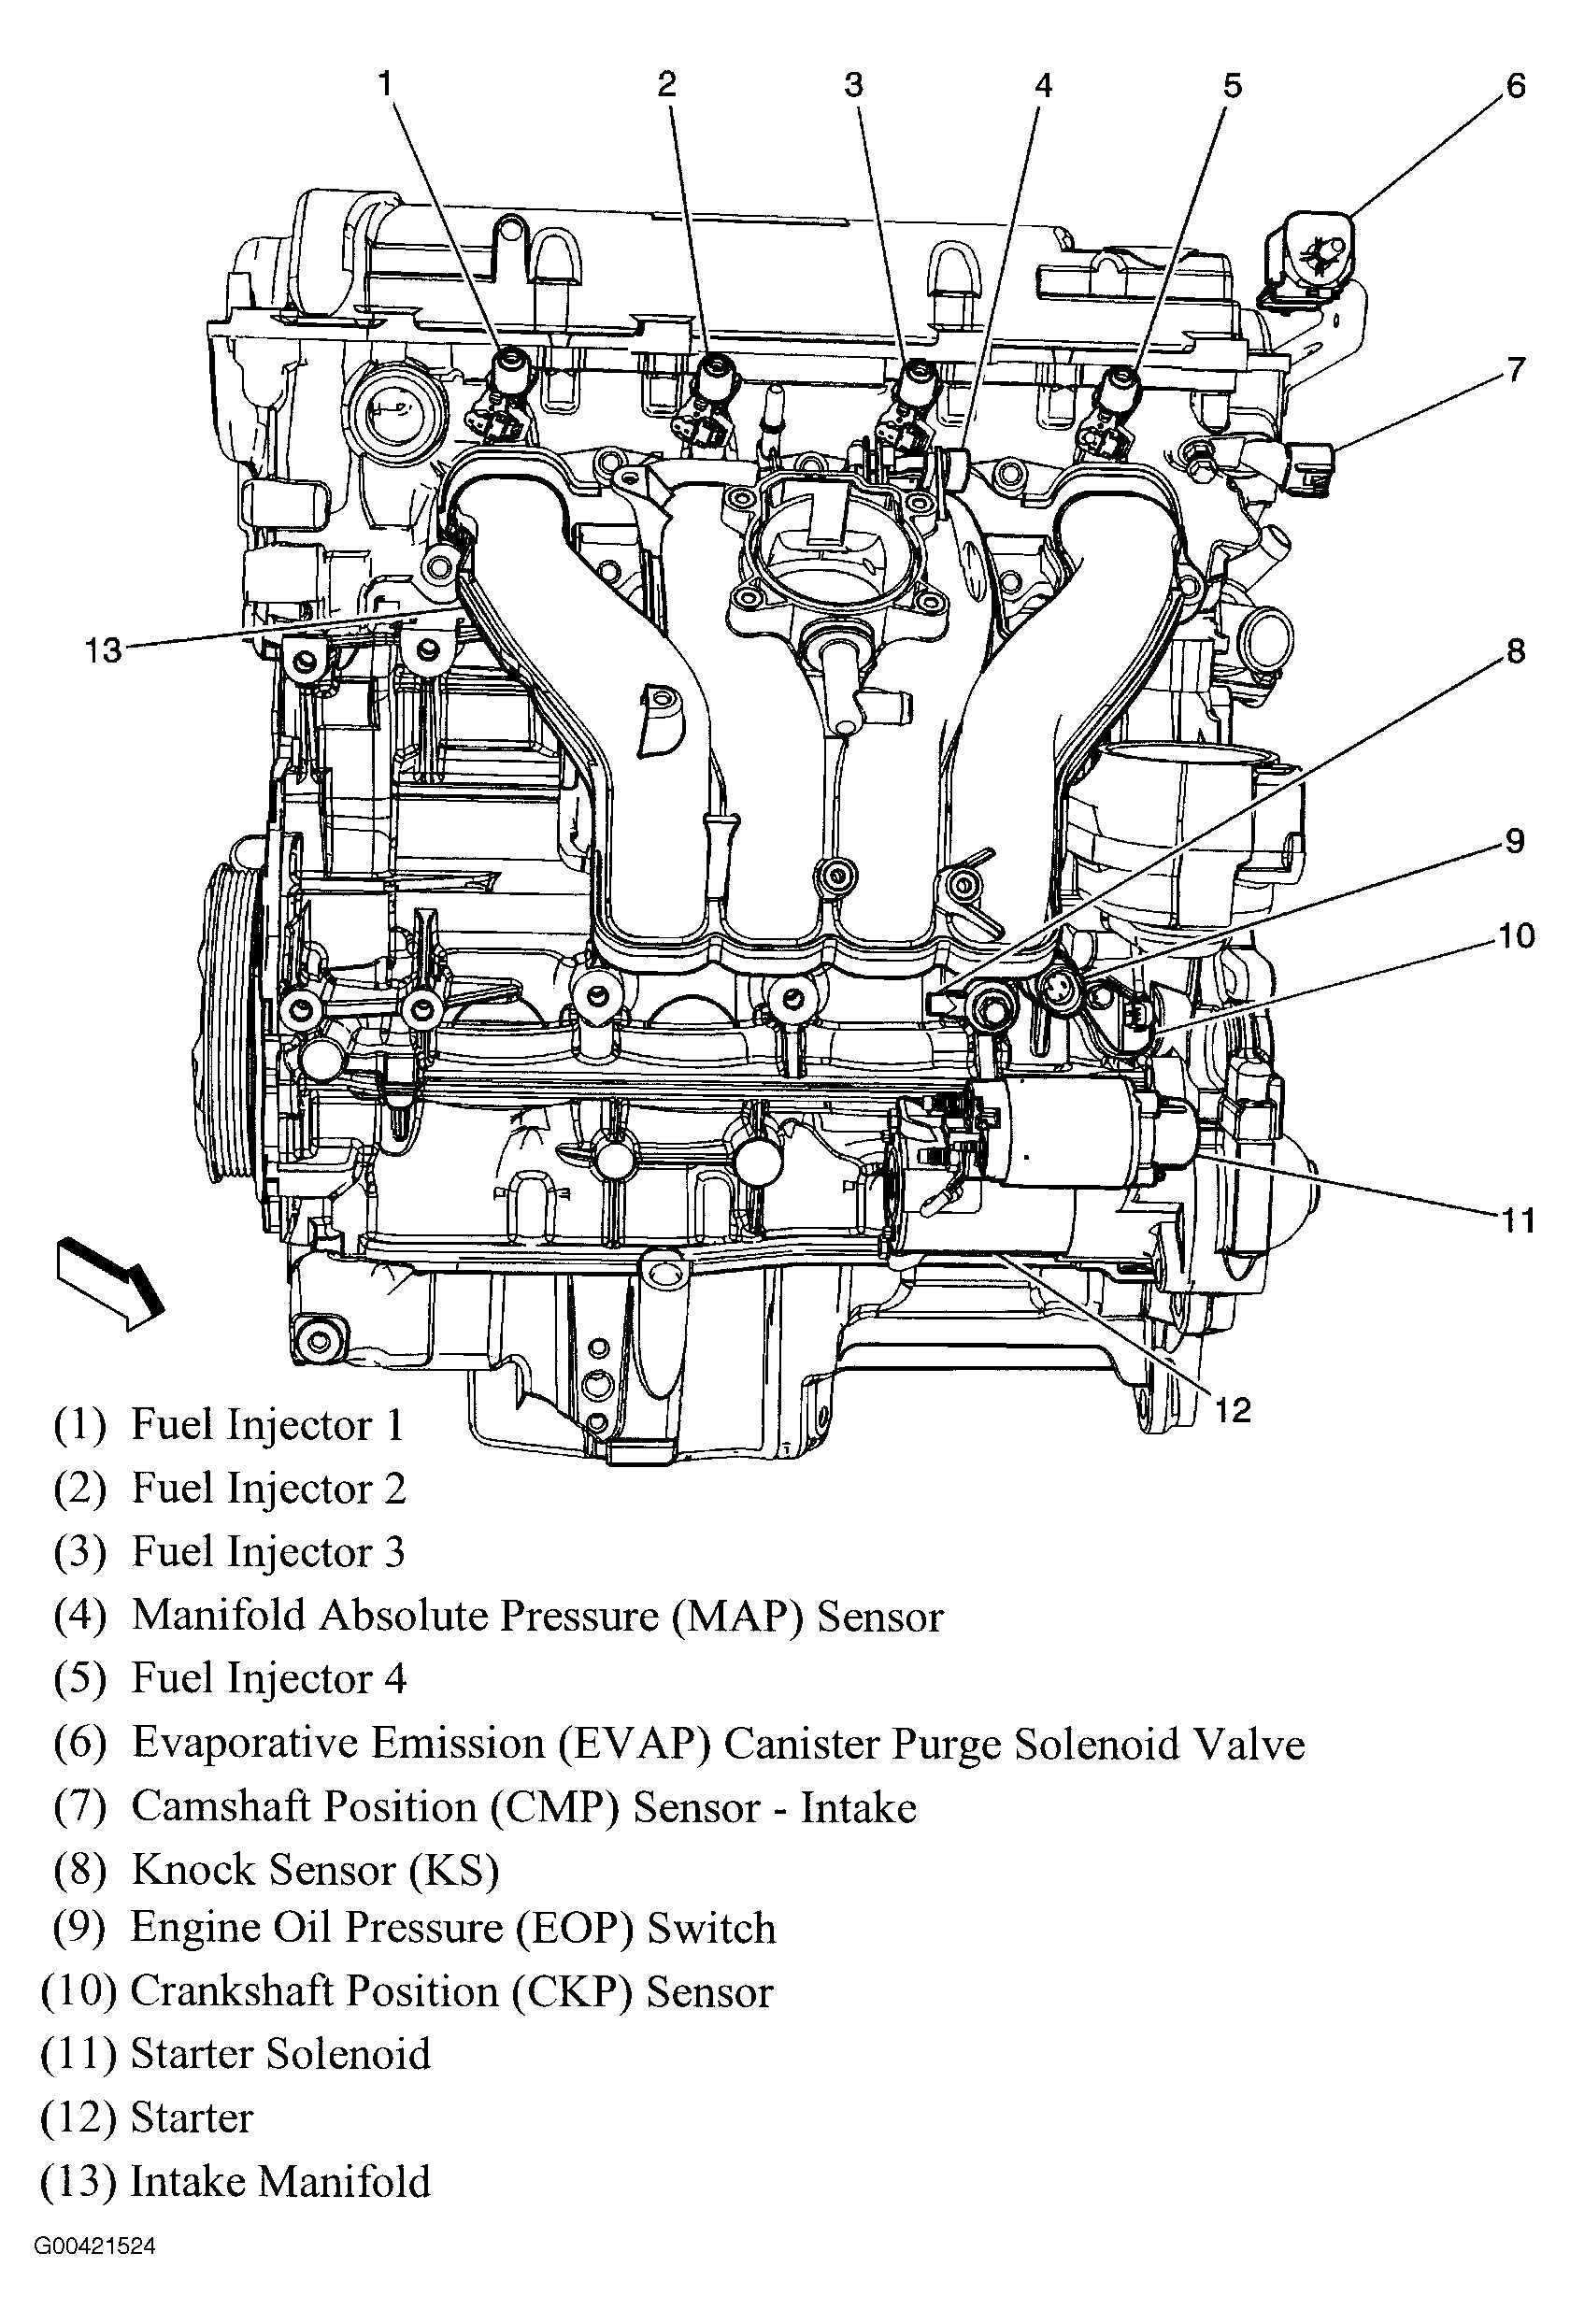 Ecotec 2.2 Engine Oil Circulation System Diagram 3 1 Liter Gm Engine Oiling Diagram Wiring Diagram Of Ecotec 2.2 Engine Oil Circulation System Diagram